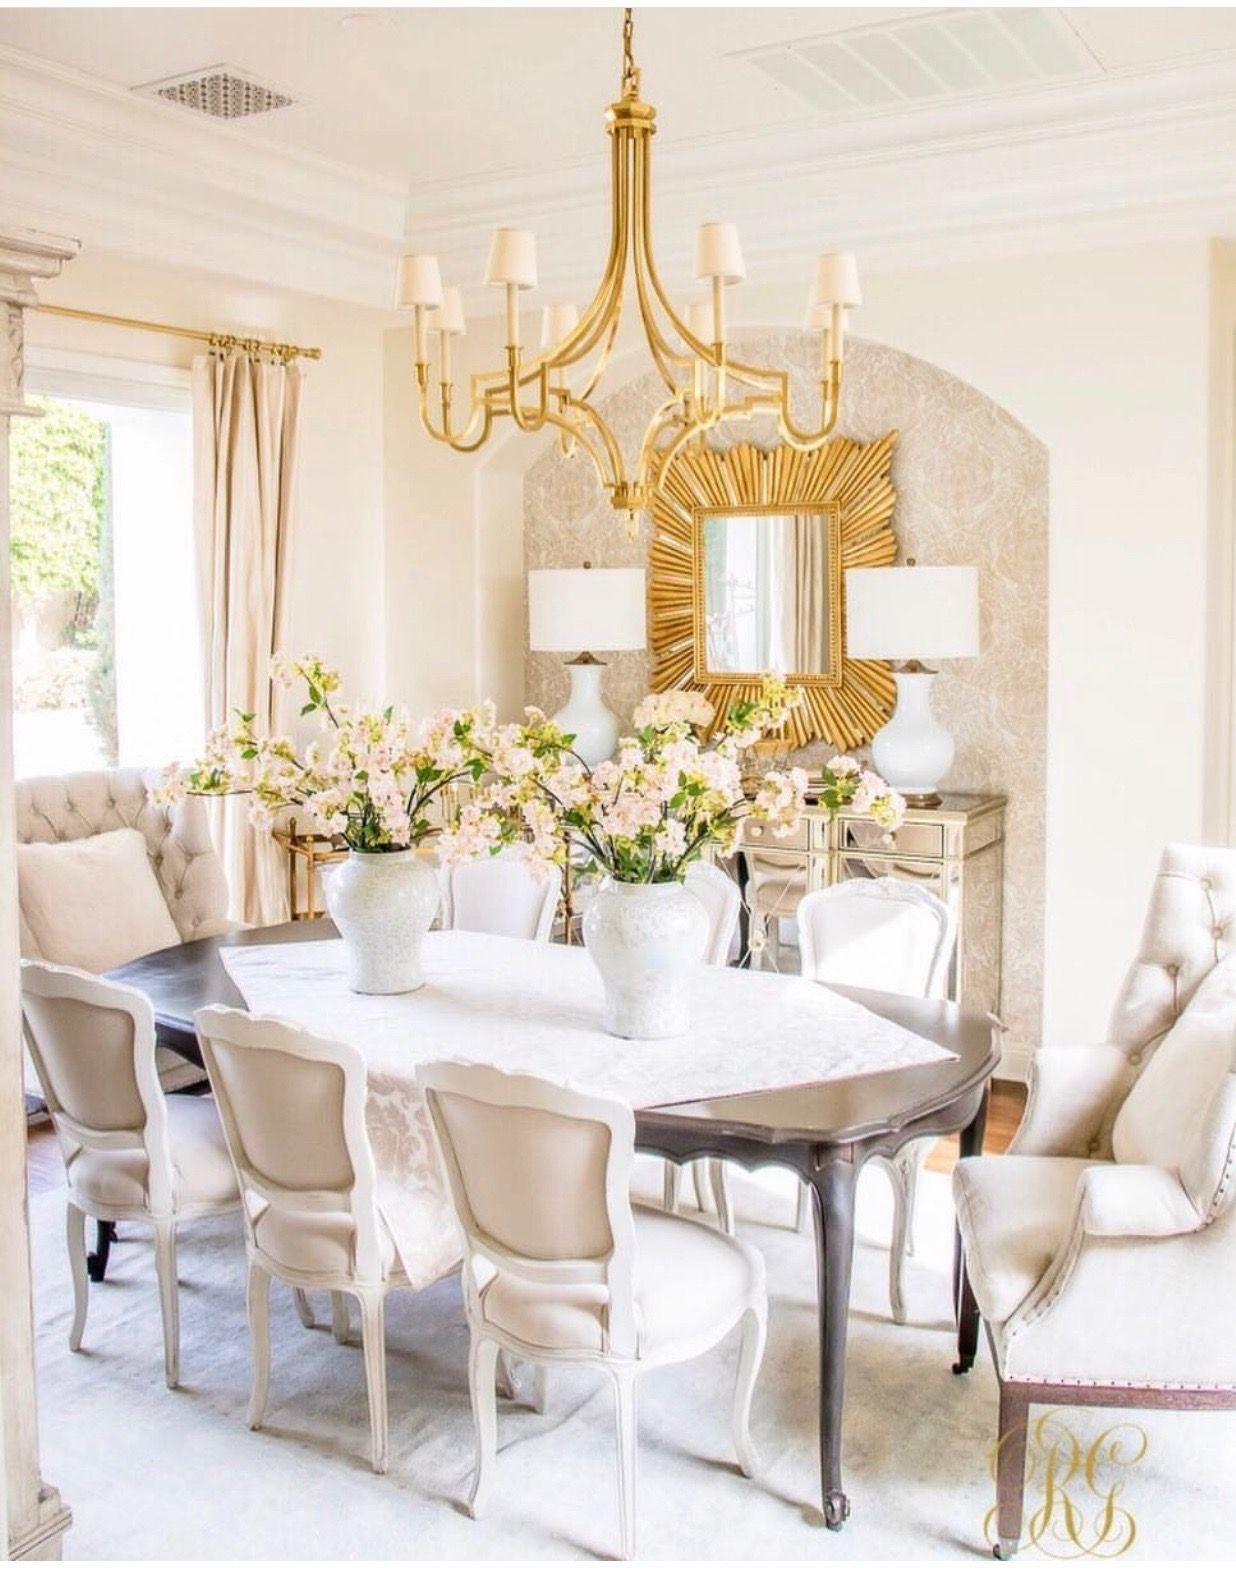 High Quality Interior Design Tips, Interior Decorating, Decorating Tips, Dining Room  Design, Dining Area